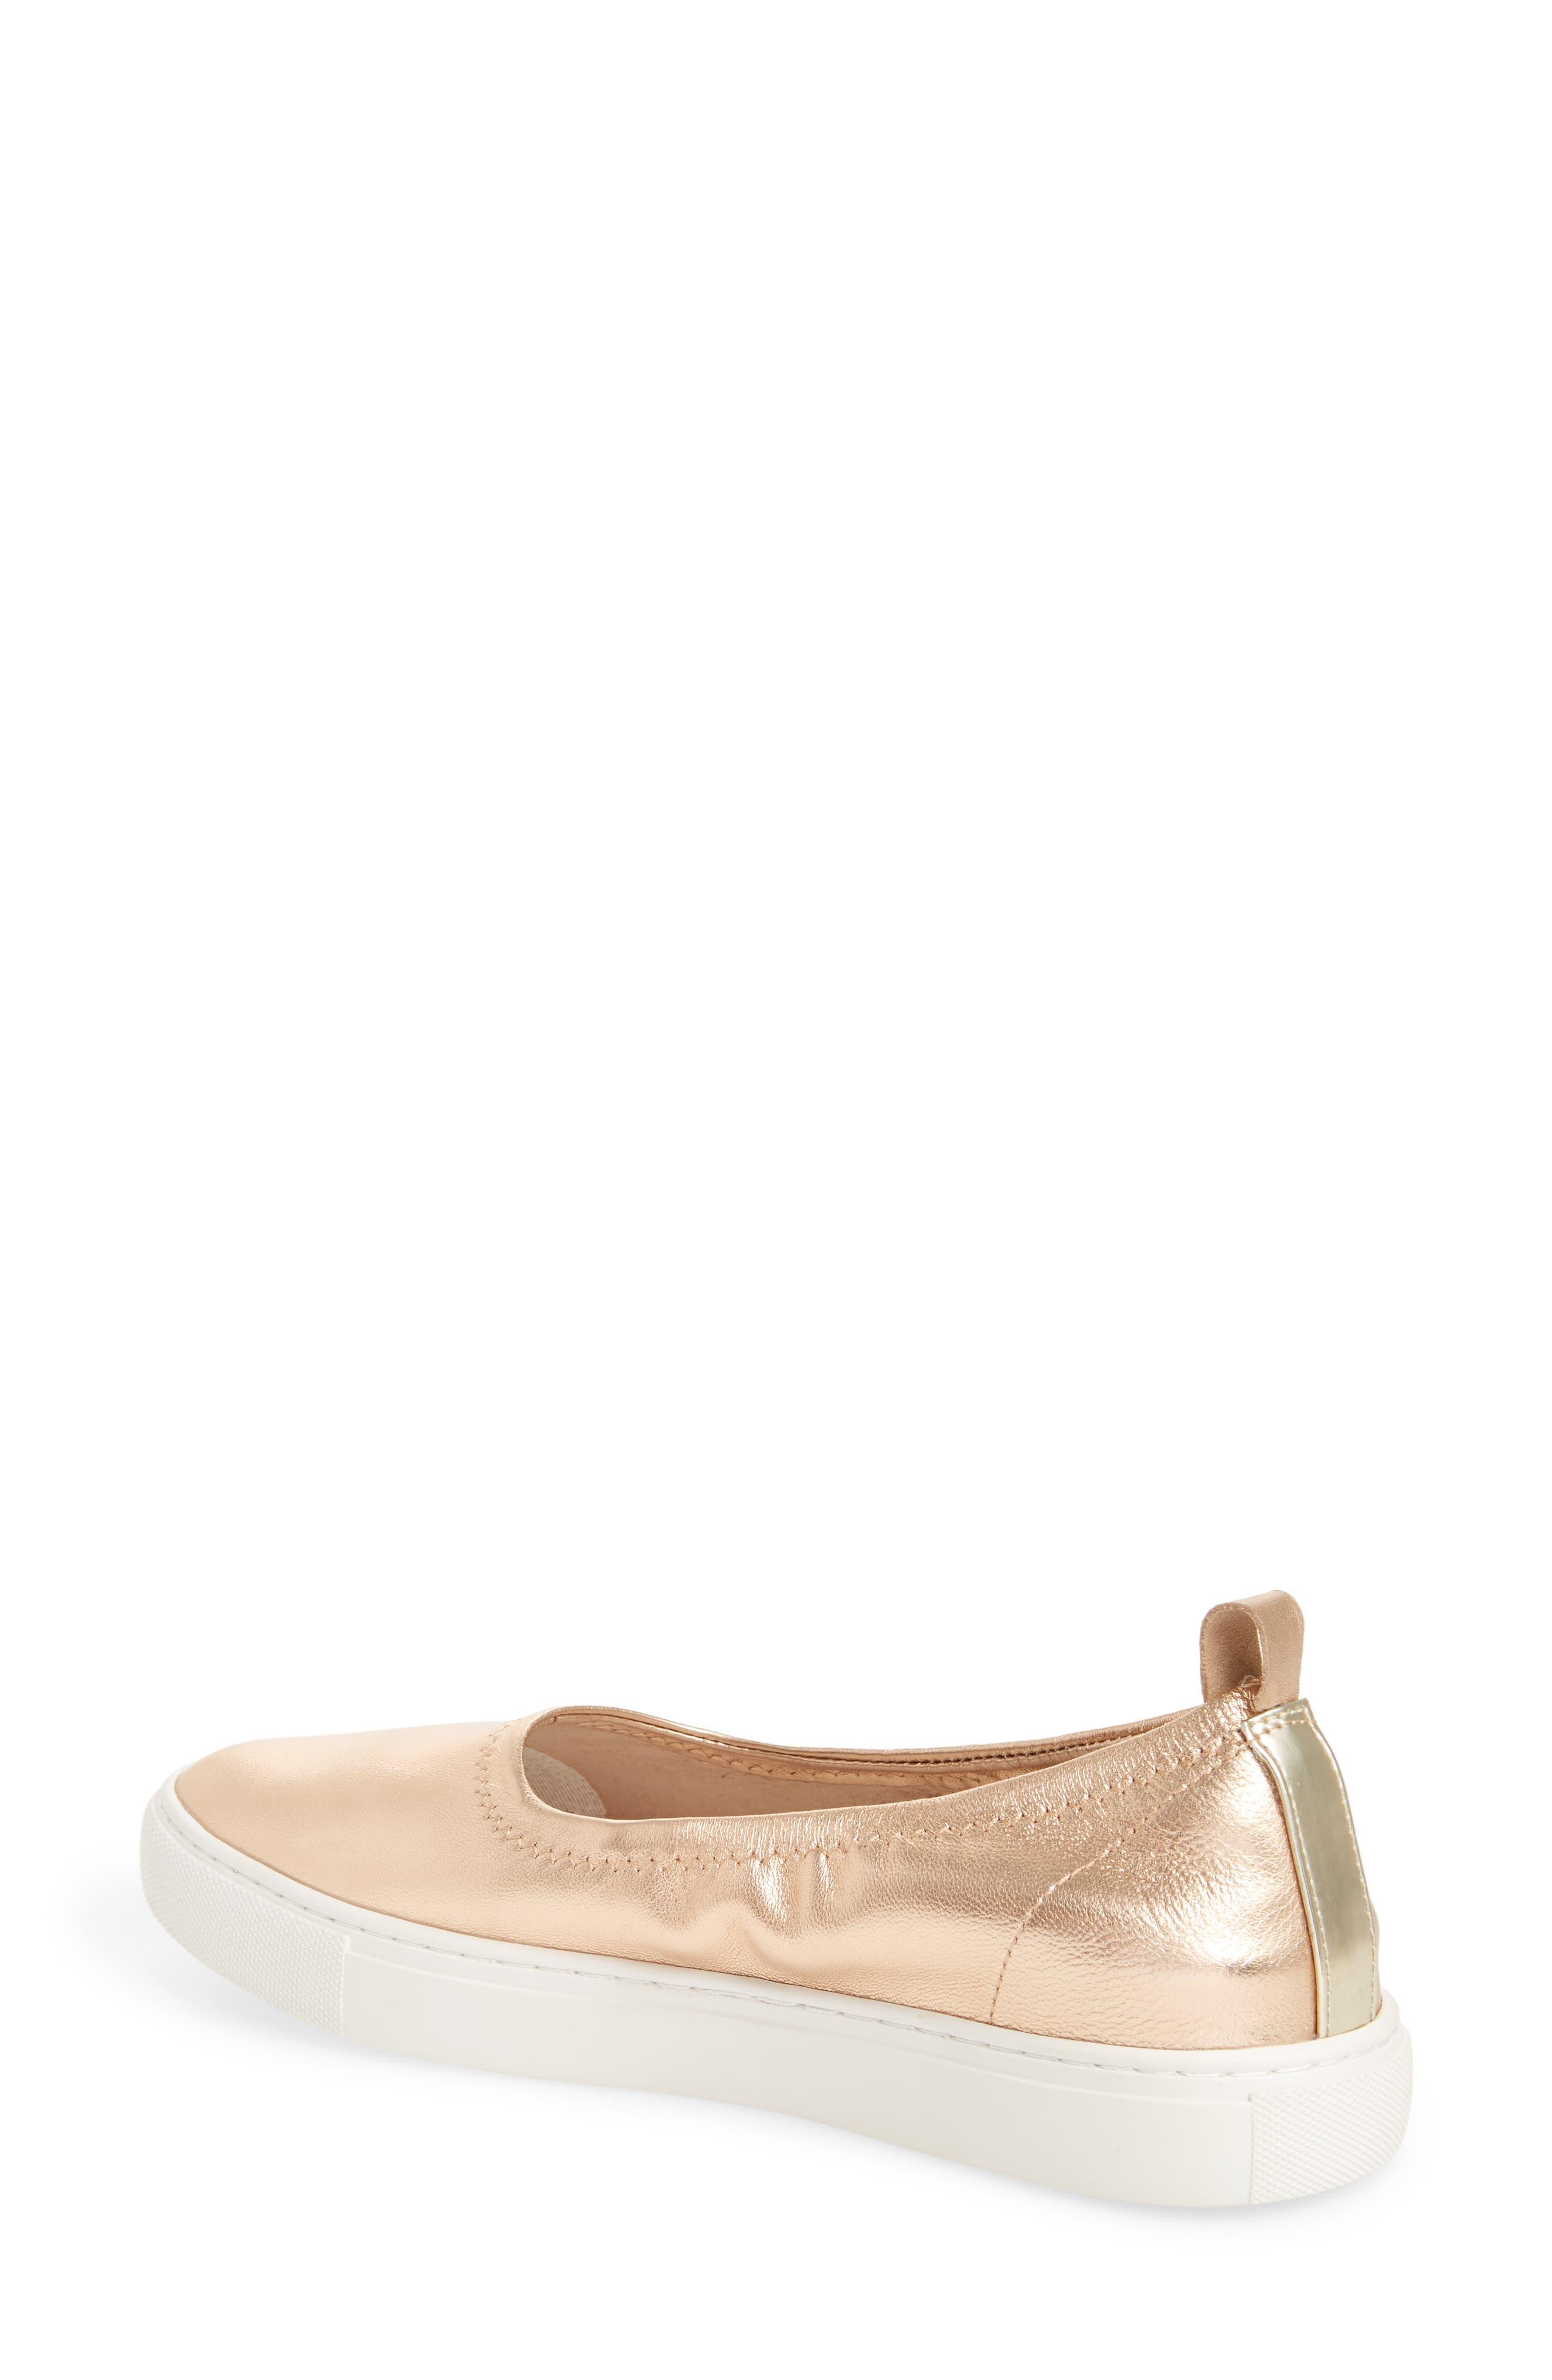 Kam Techni-Cole Ballet Flat,                             Alternate thumbnail 2, color,                             Rose Gold Leather